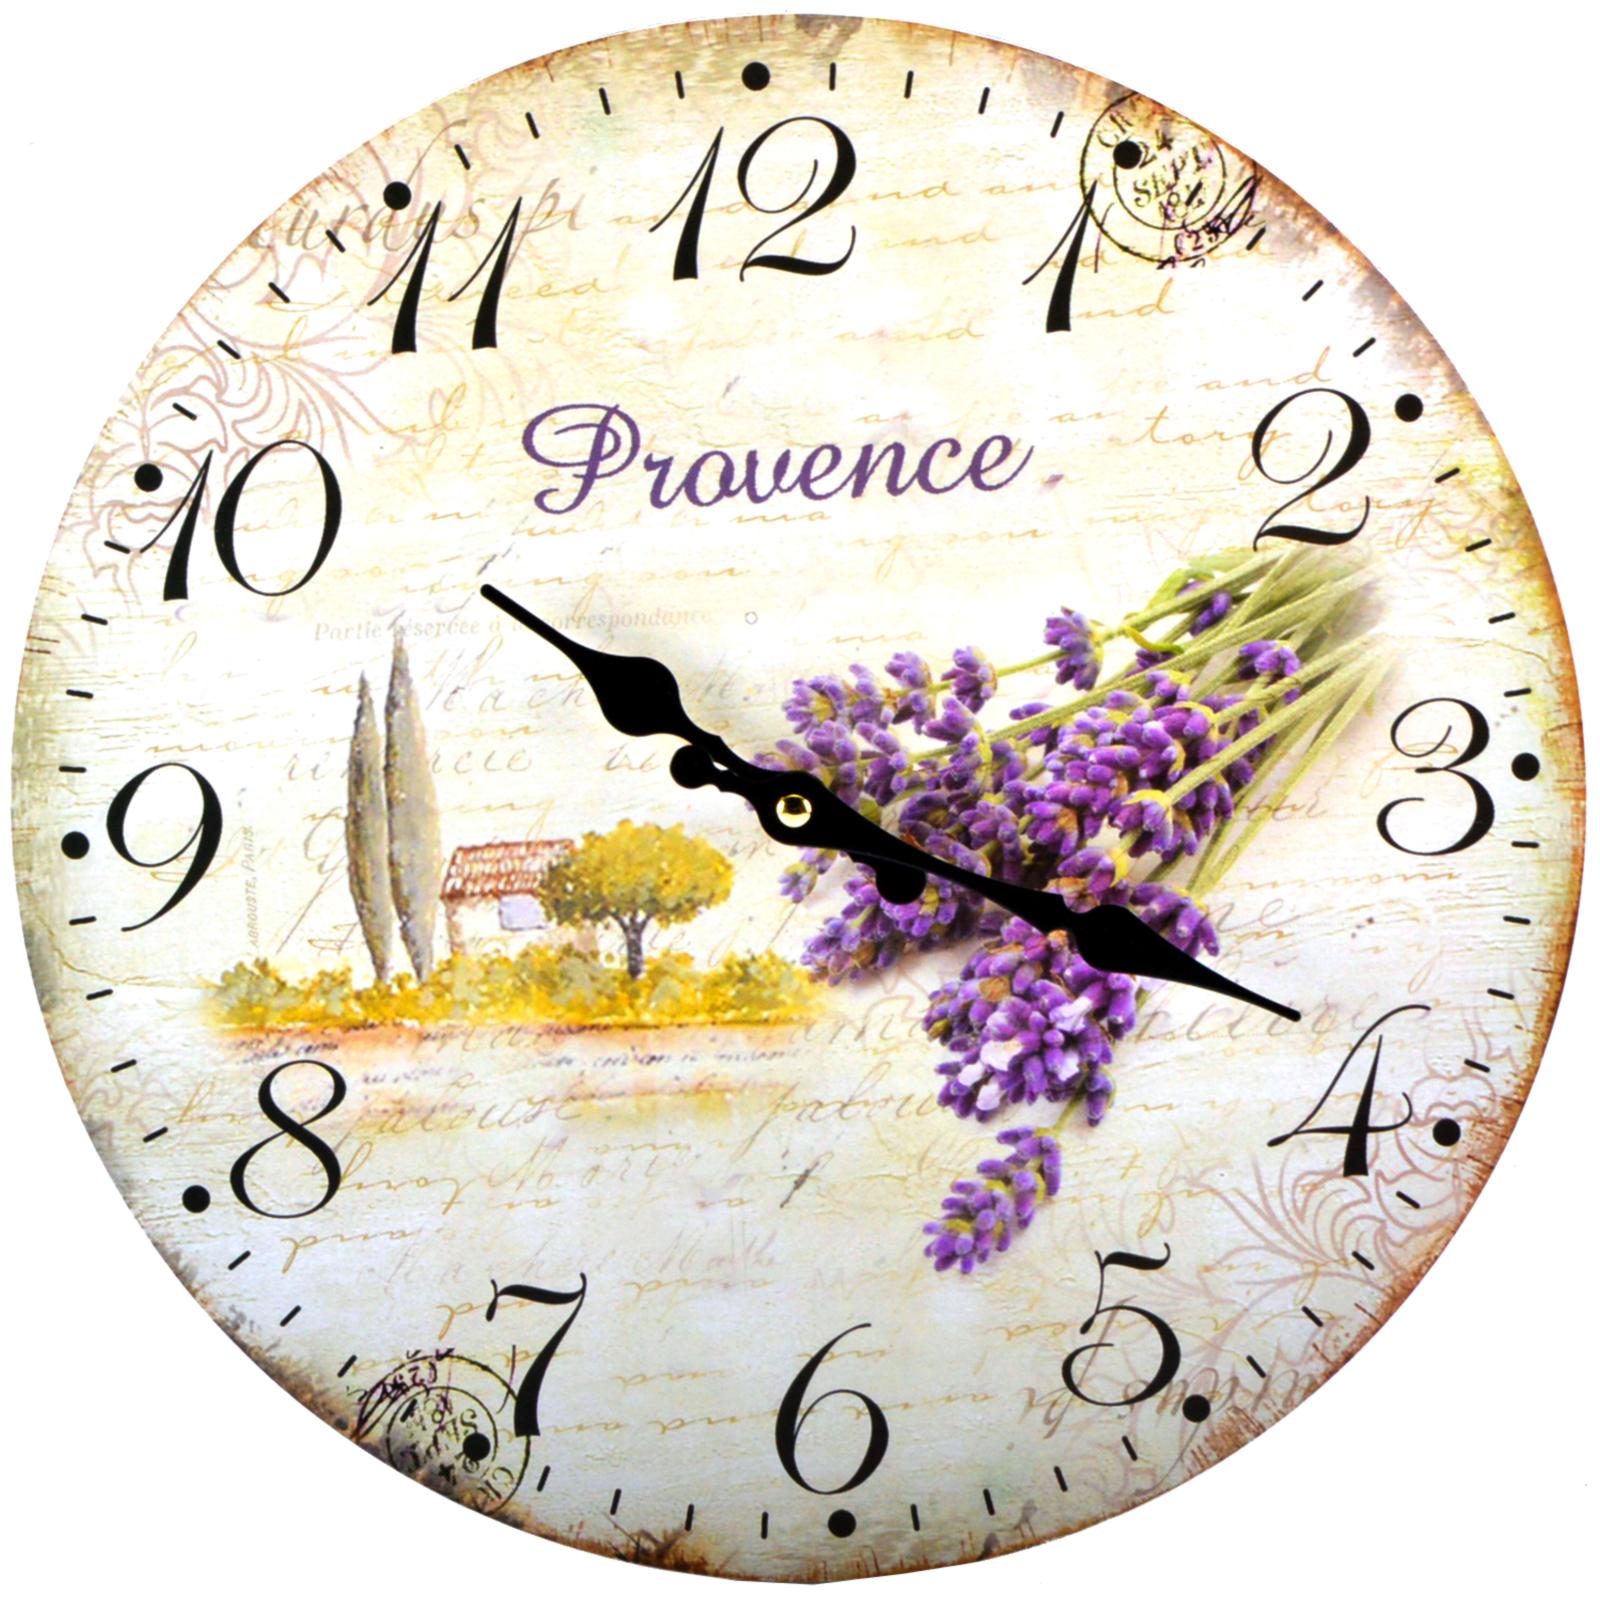 12 modelo relojes de pared casa campo madera cocina horas bistro shabby vintage ebay - Reloj de pared para cocina ...